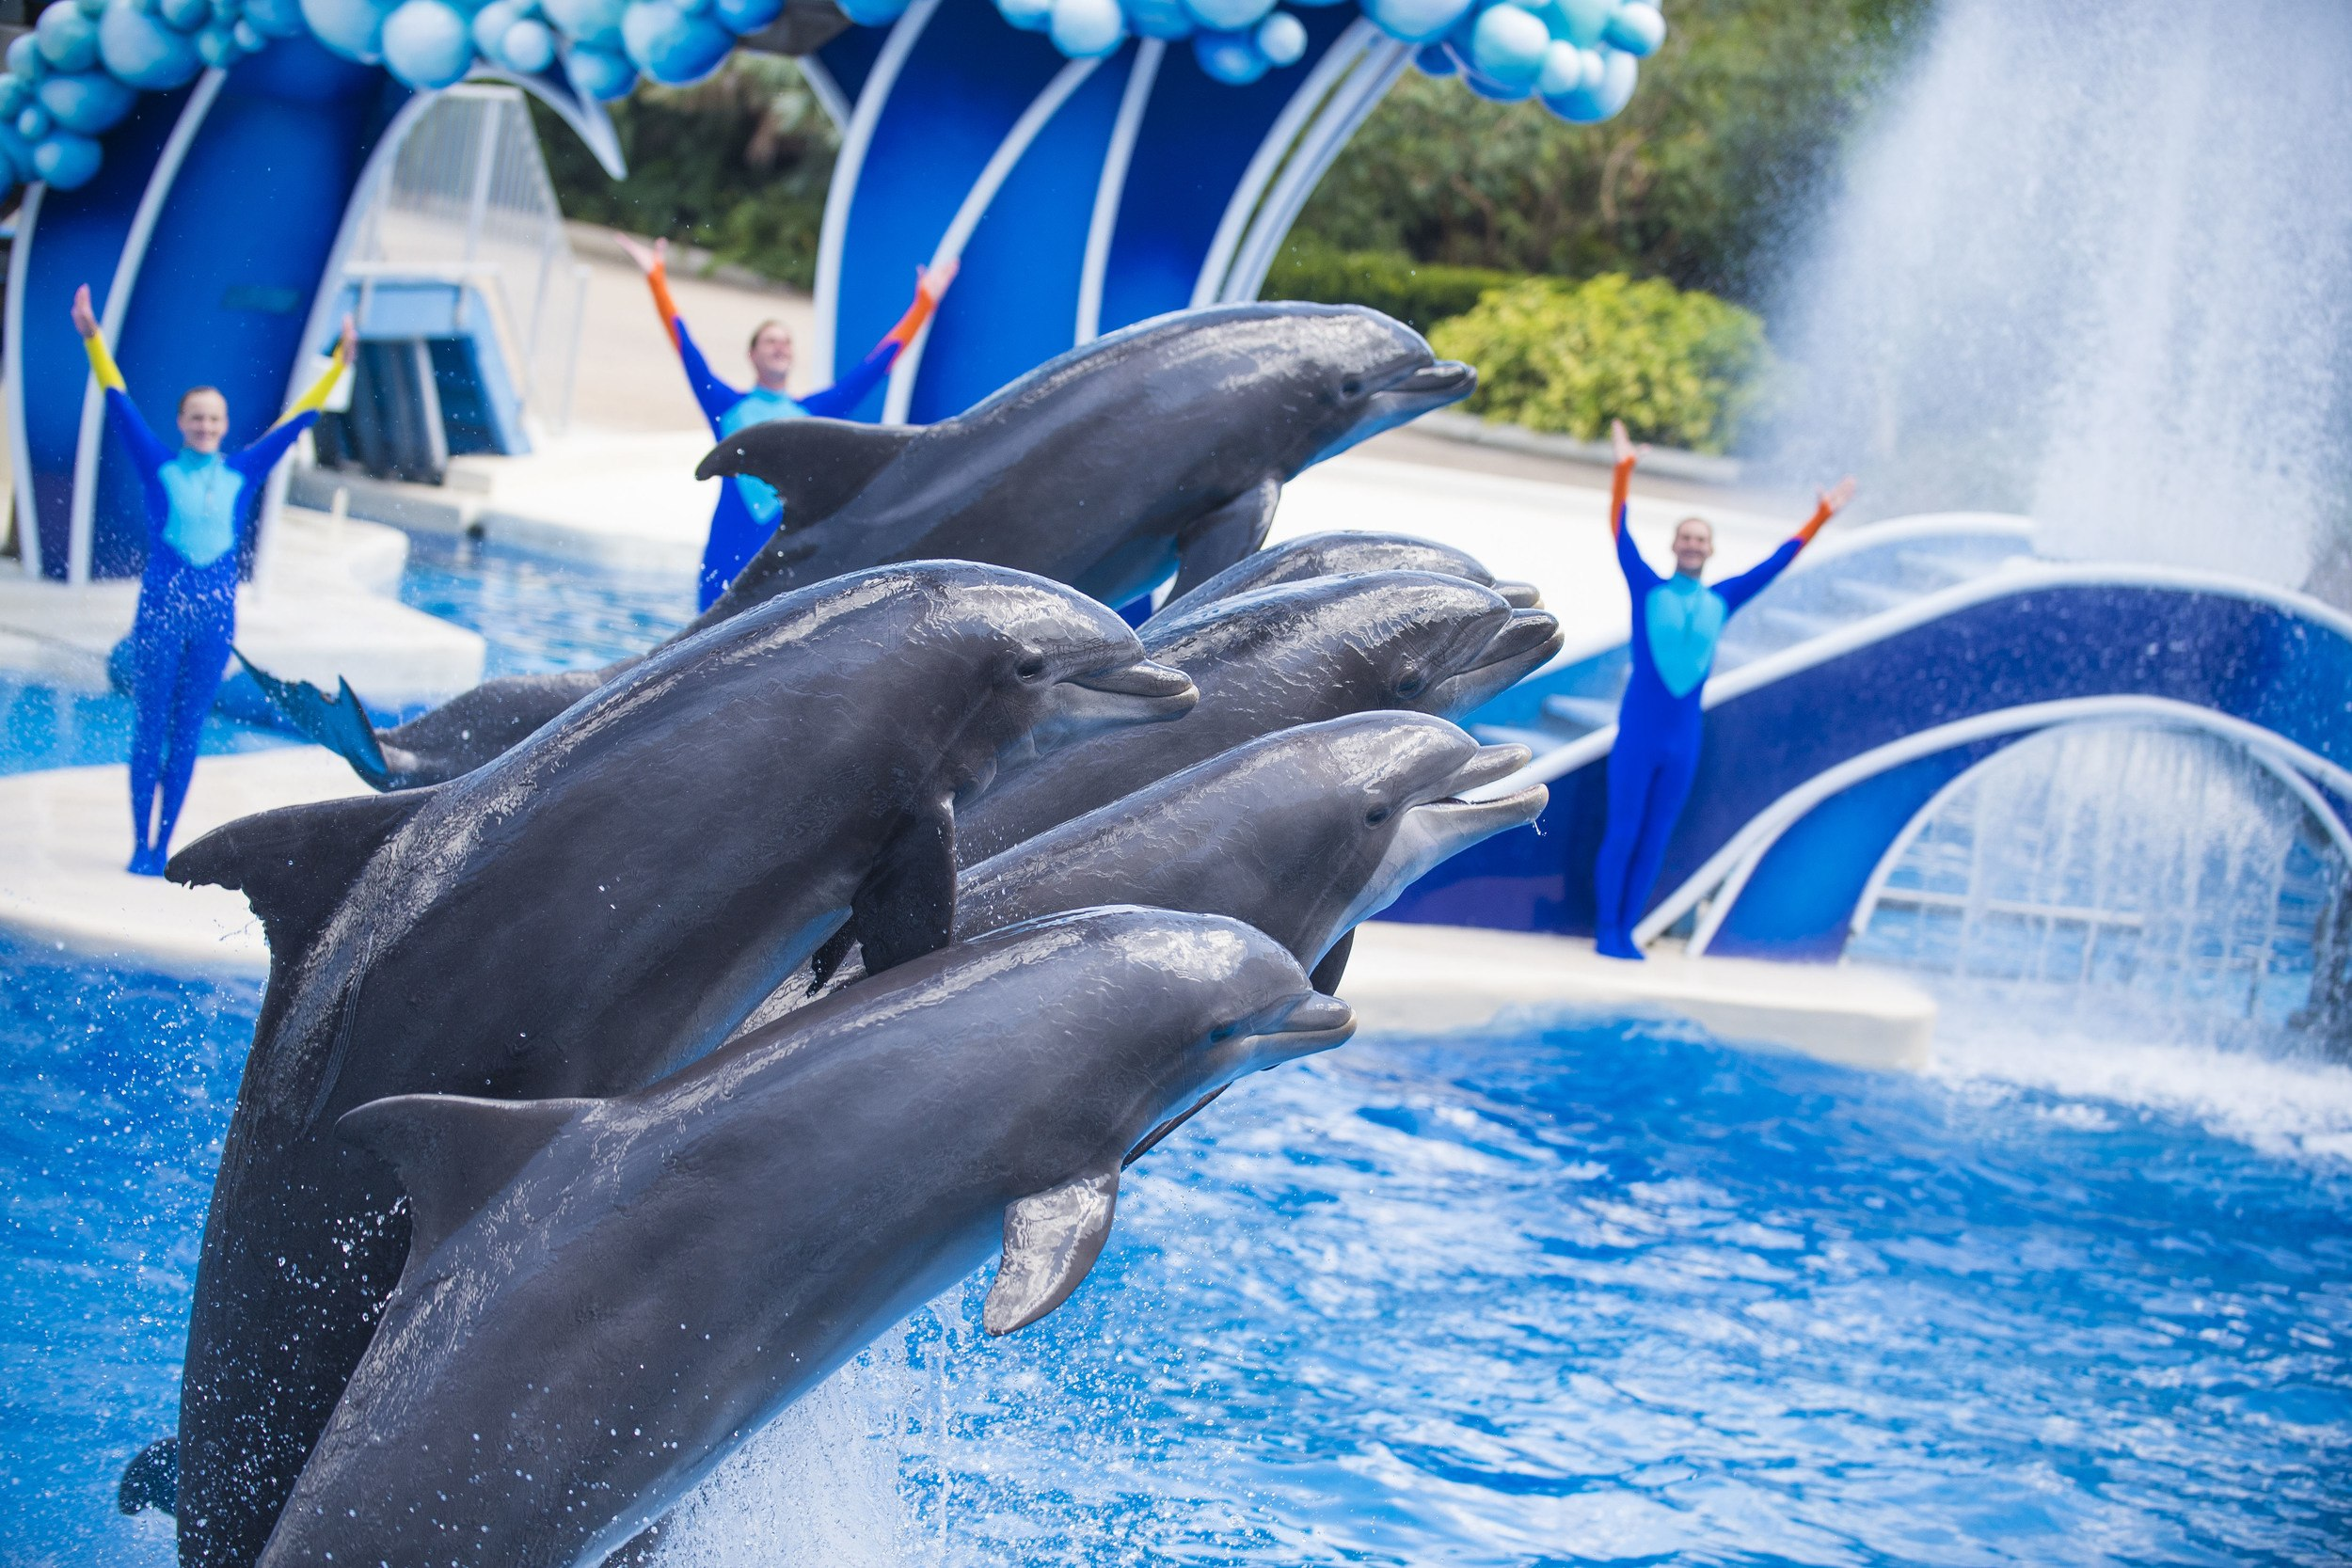 Dolphin Days animal show at SeaWorld Orlando